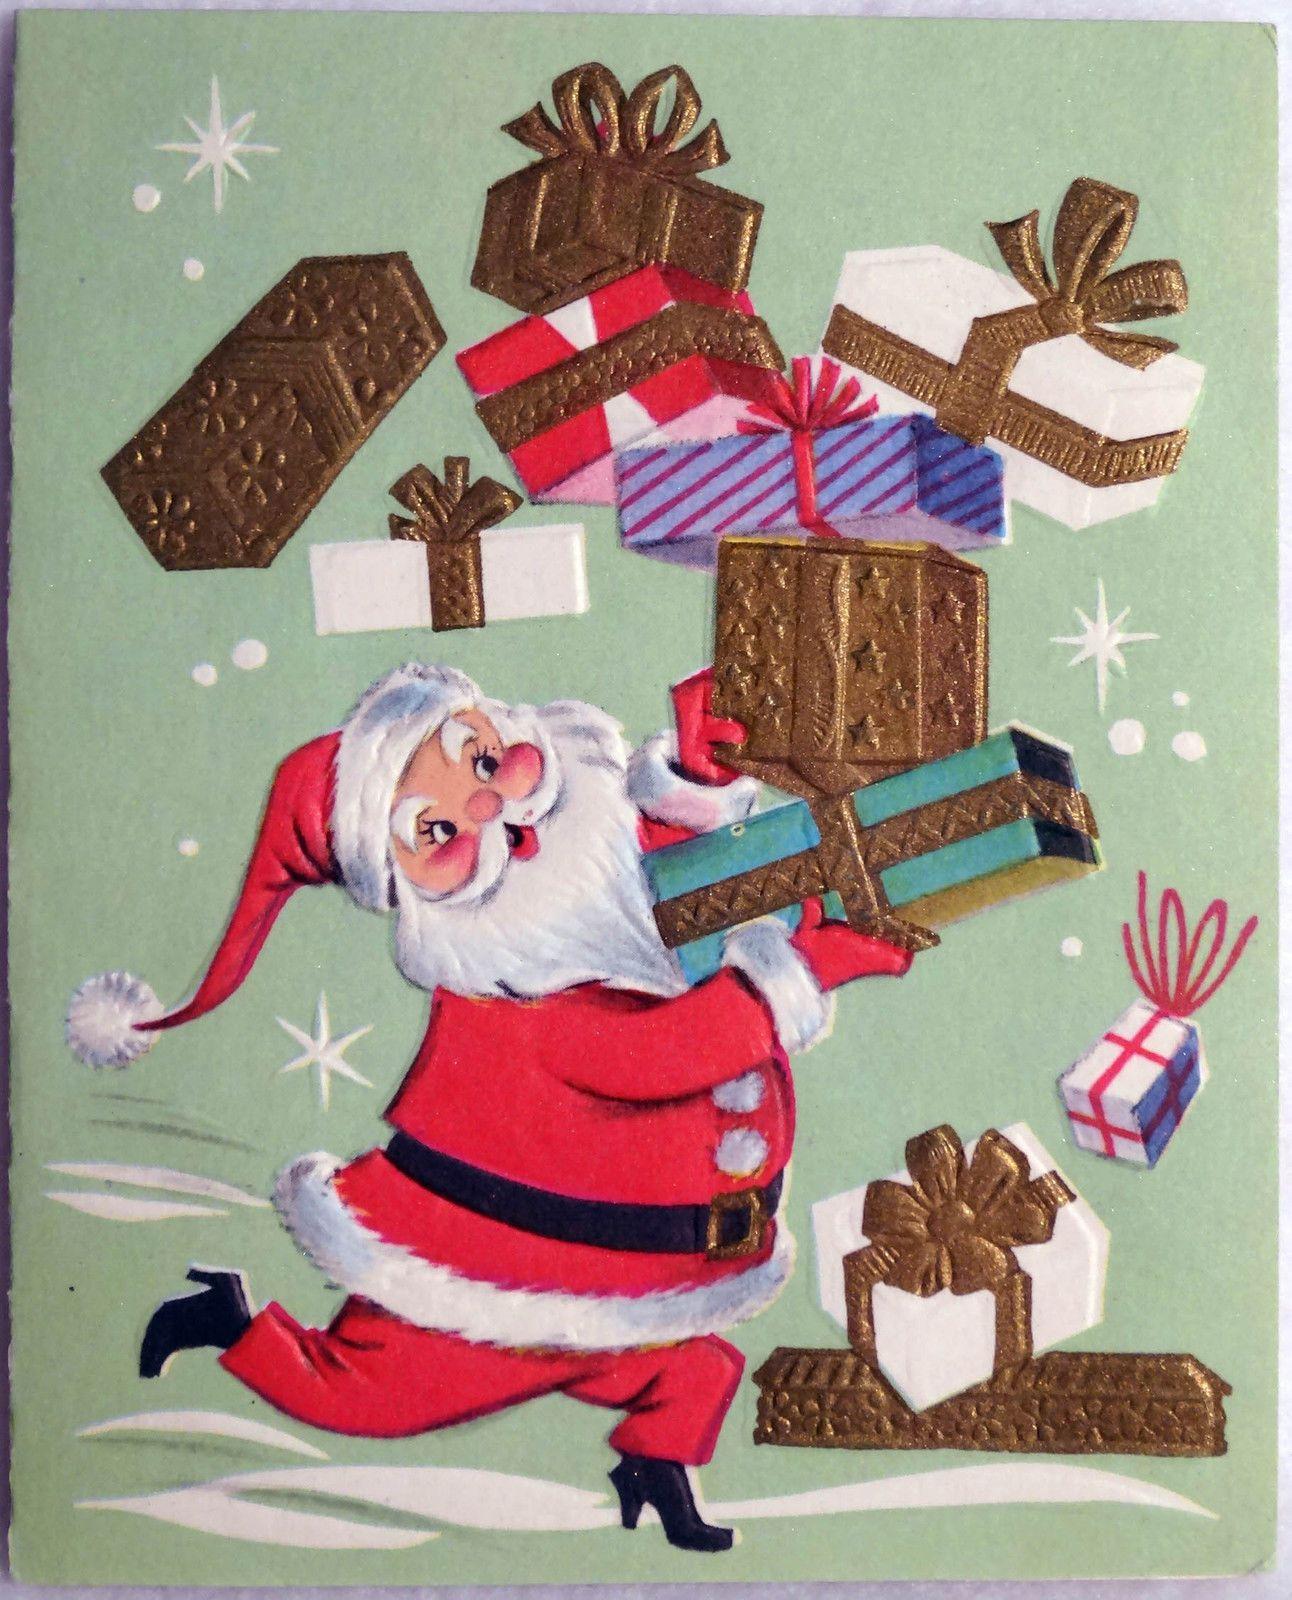 #361 50S Mid Century Modern Santa Claus Vintage Christmas Greeting